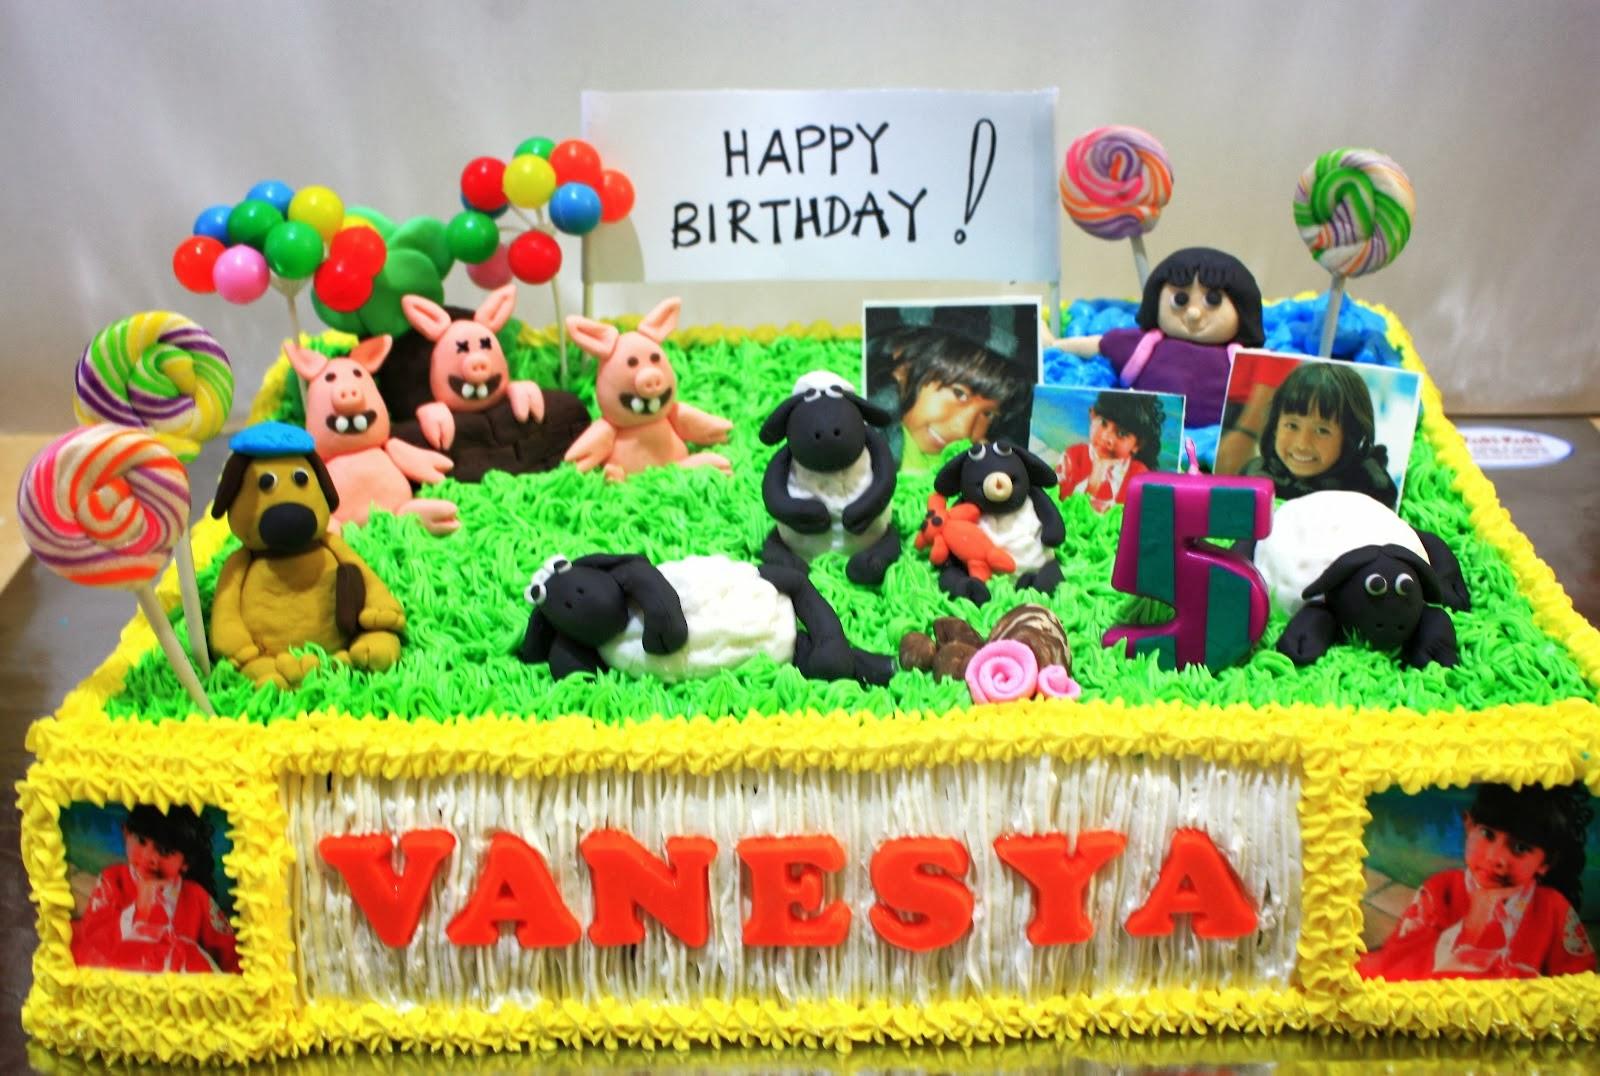 gambar kue ulang tahun   deqwan blog